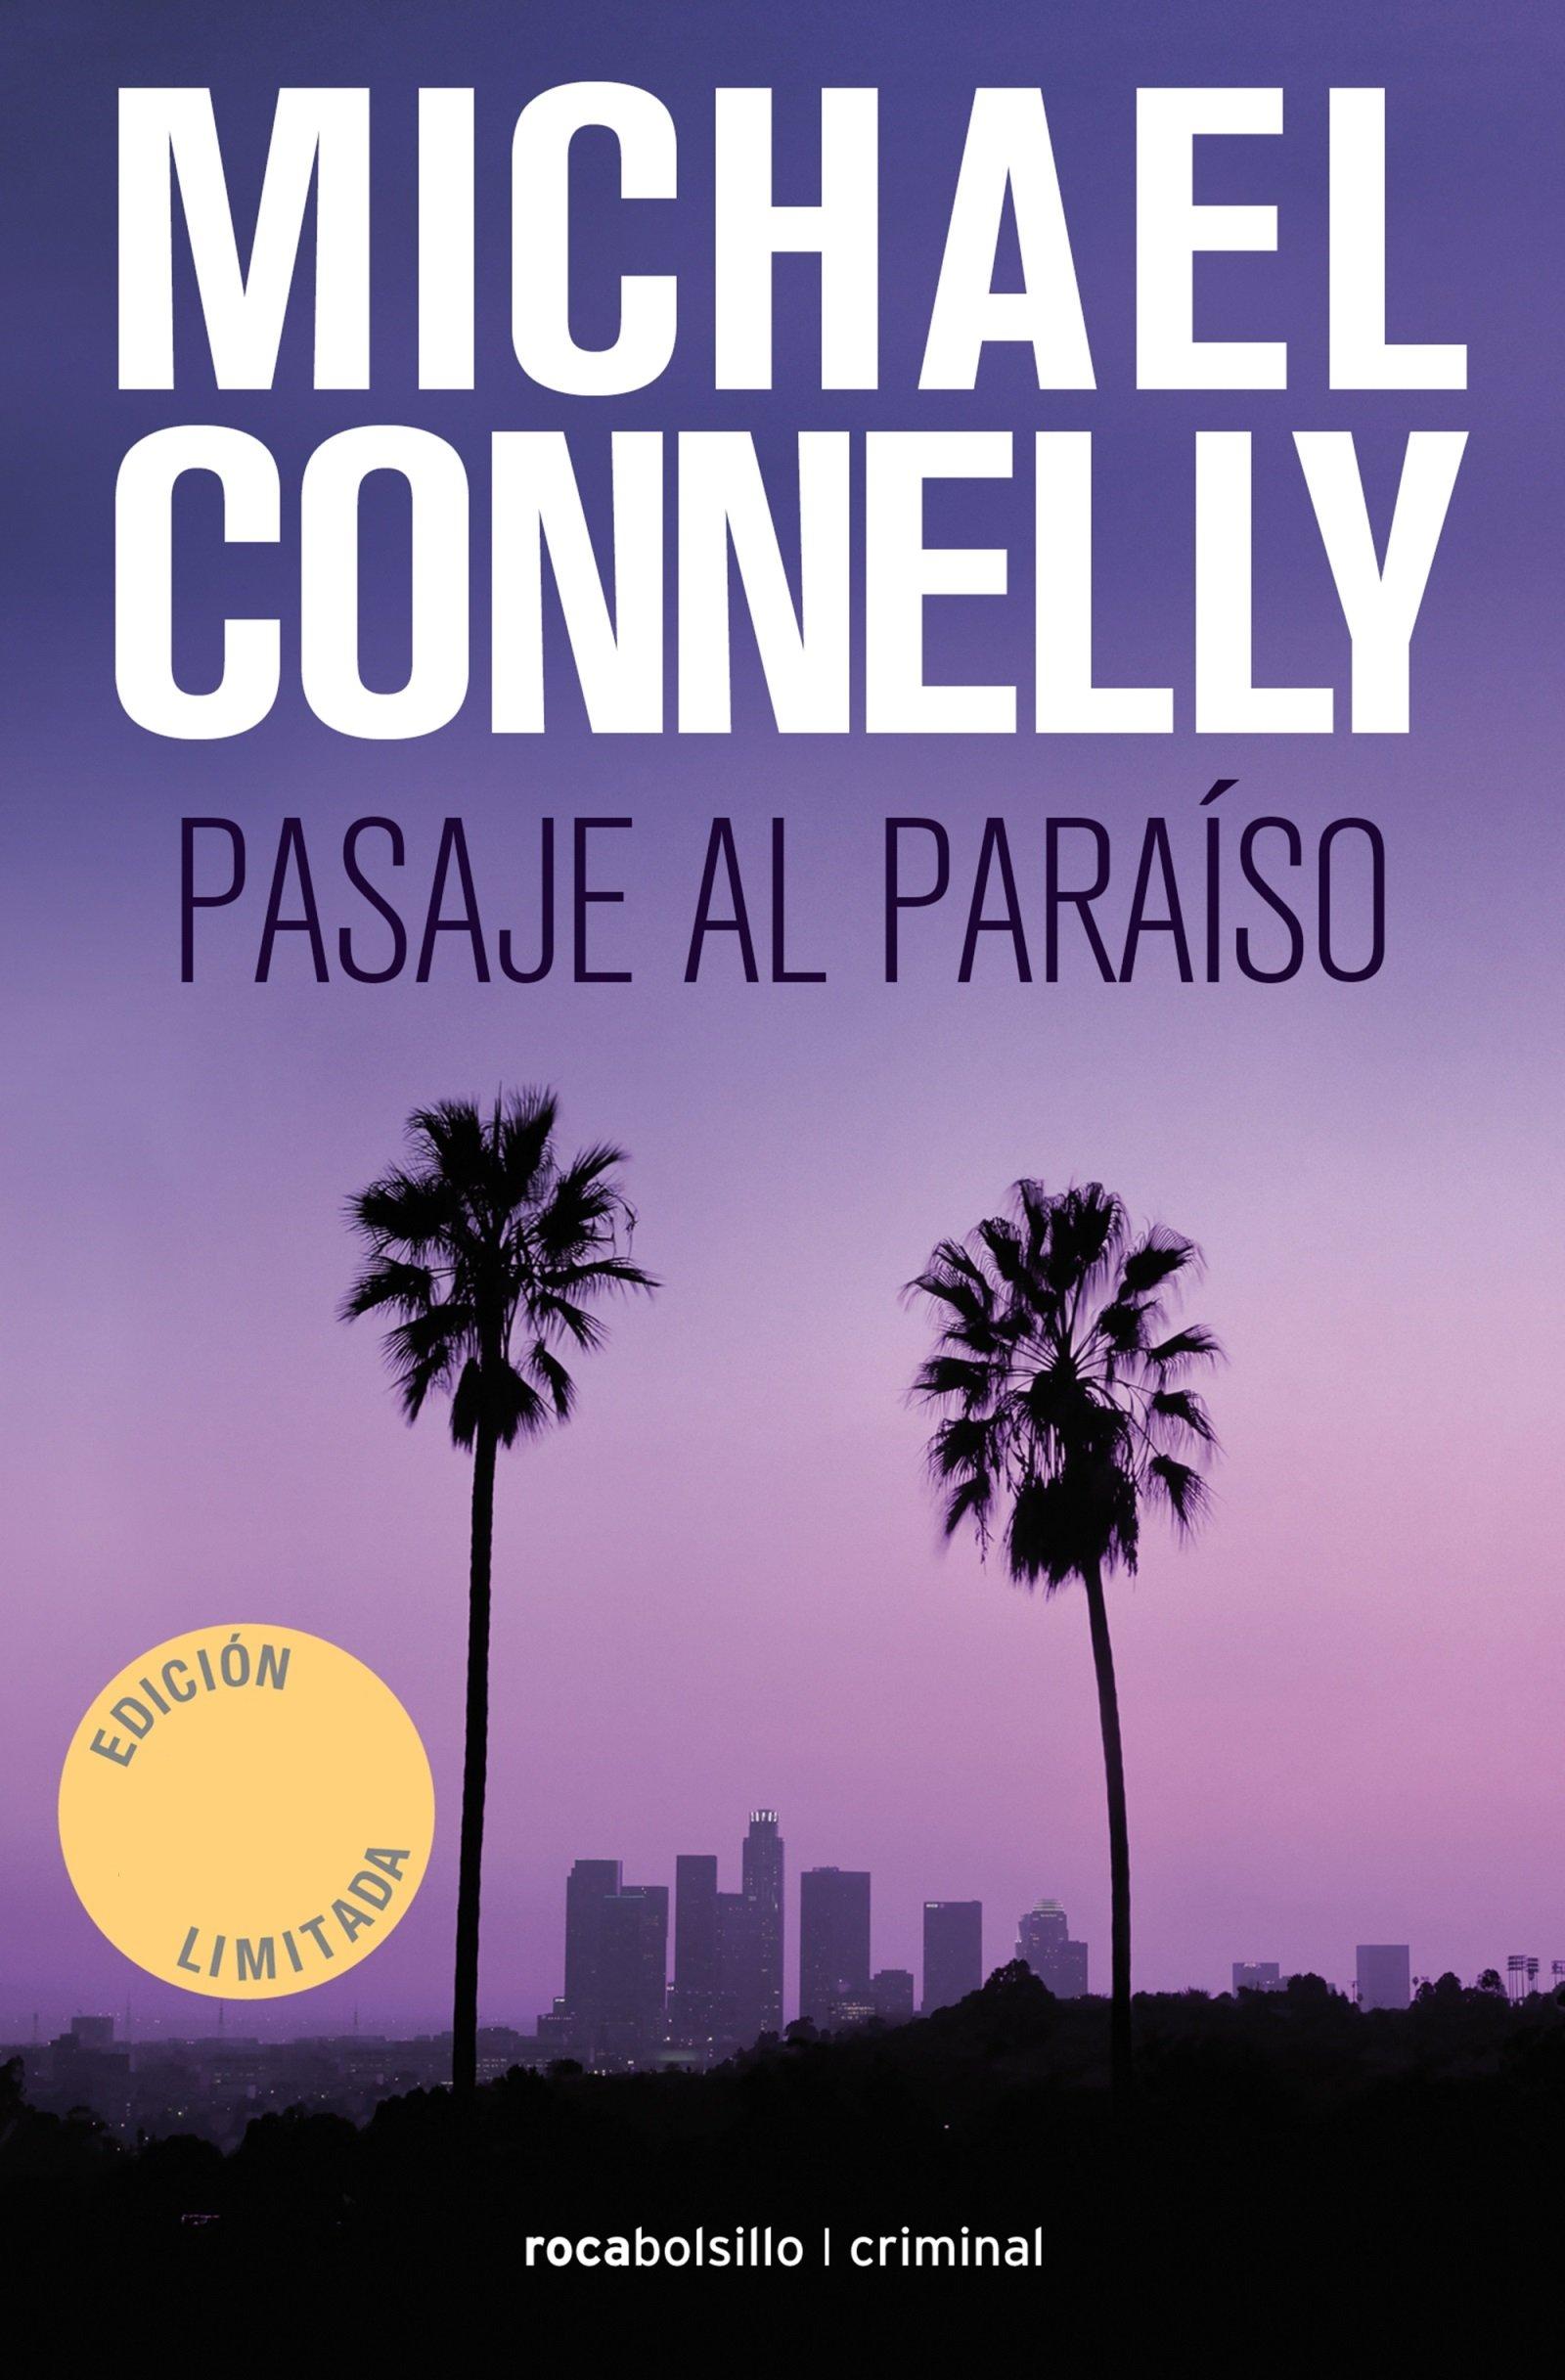 Pasaje al paraiso (Spanish Edition): Michael Connelly: 9788416859252:  Amazon.com: Books